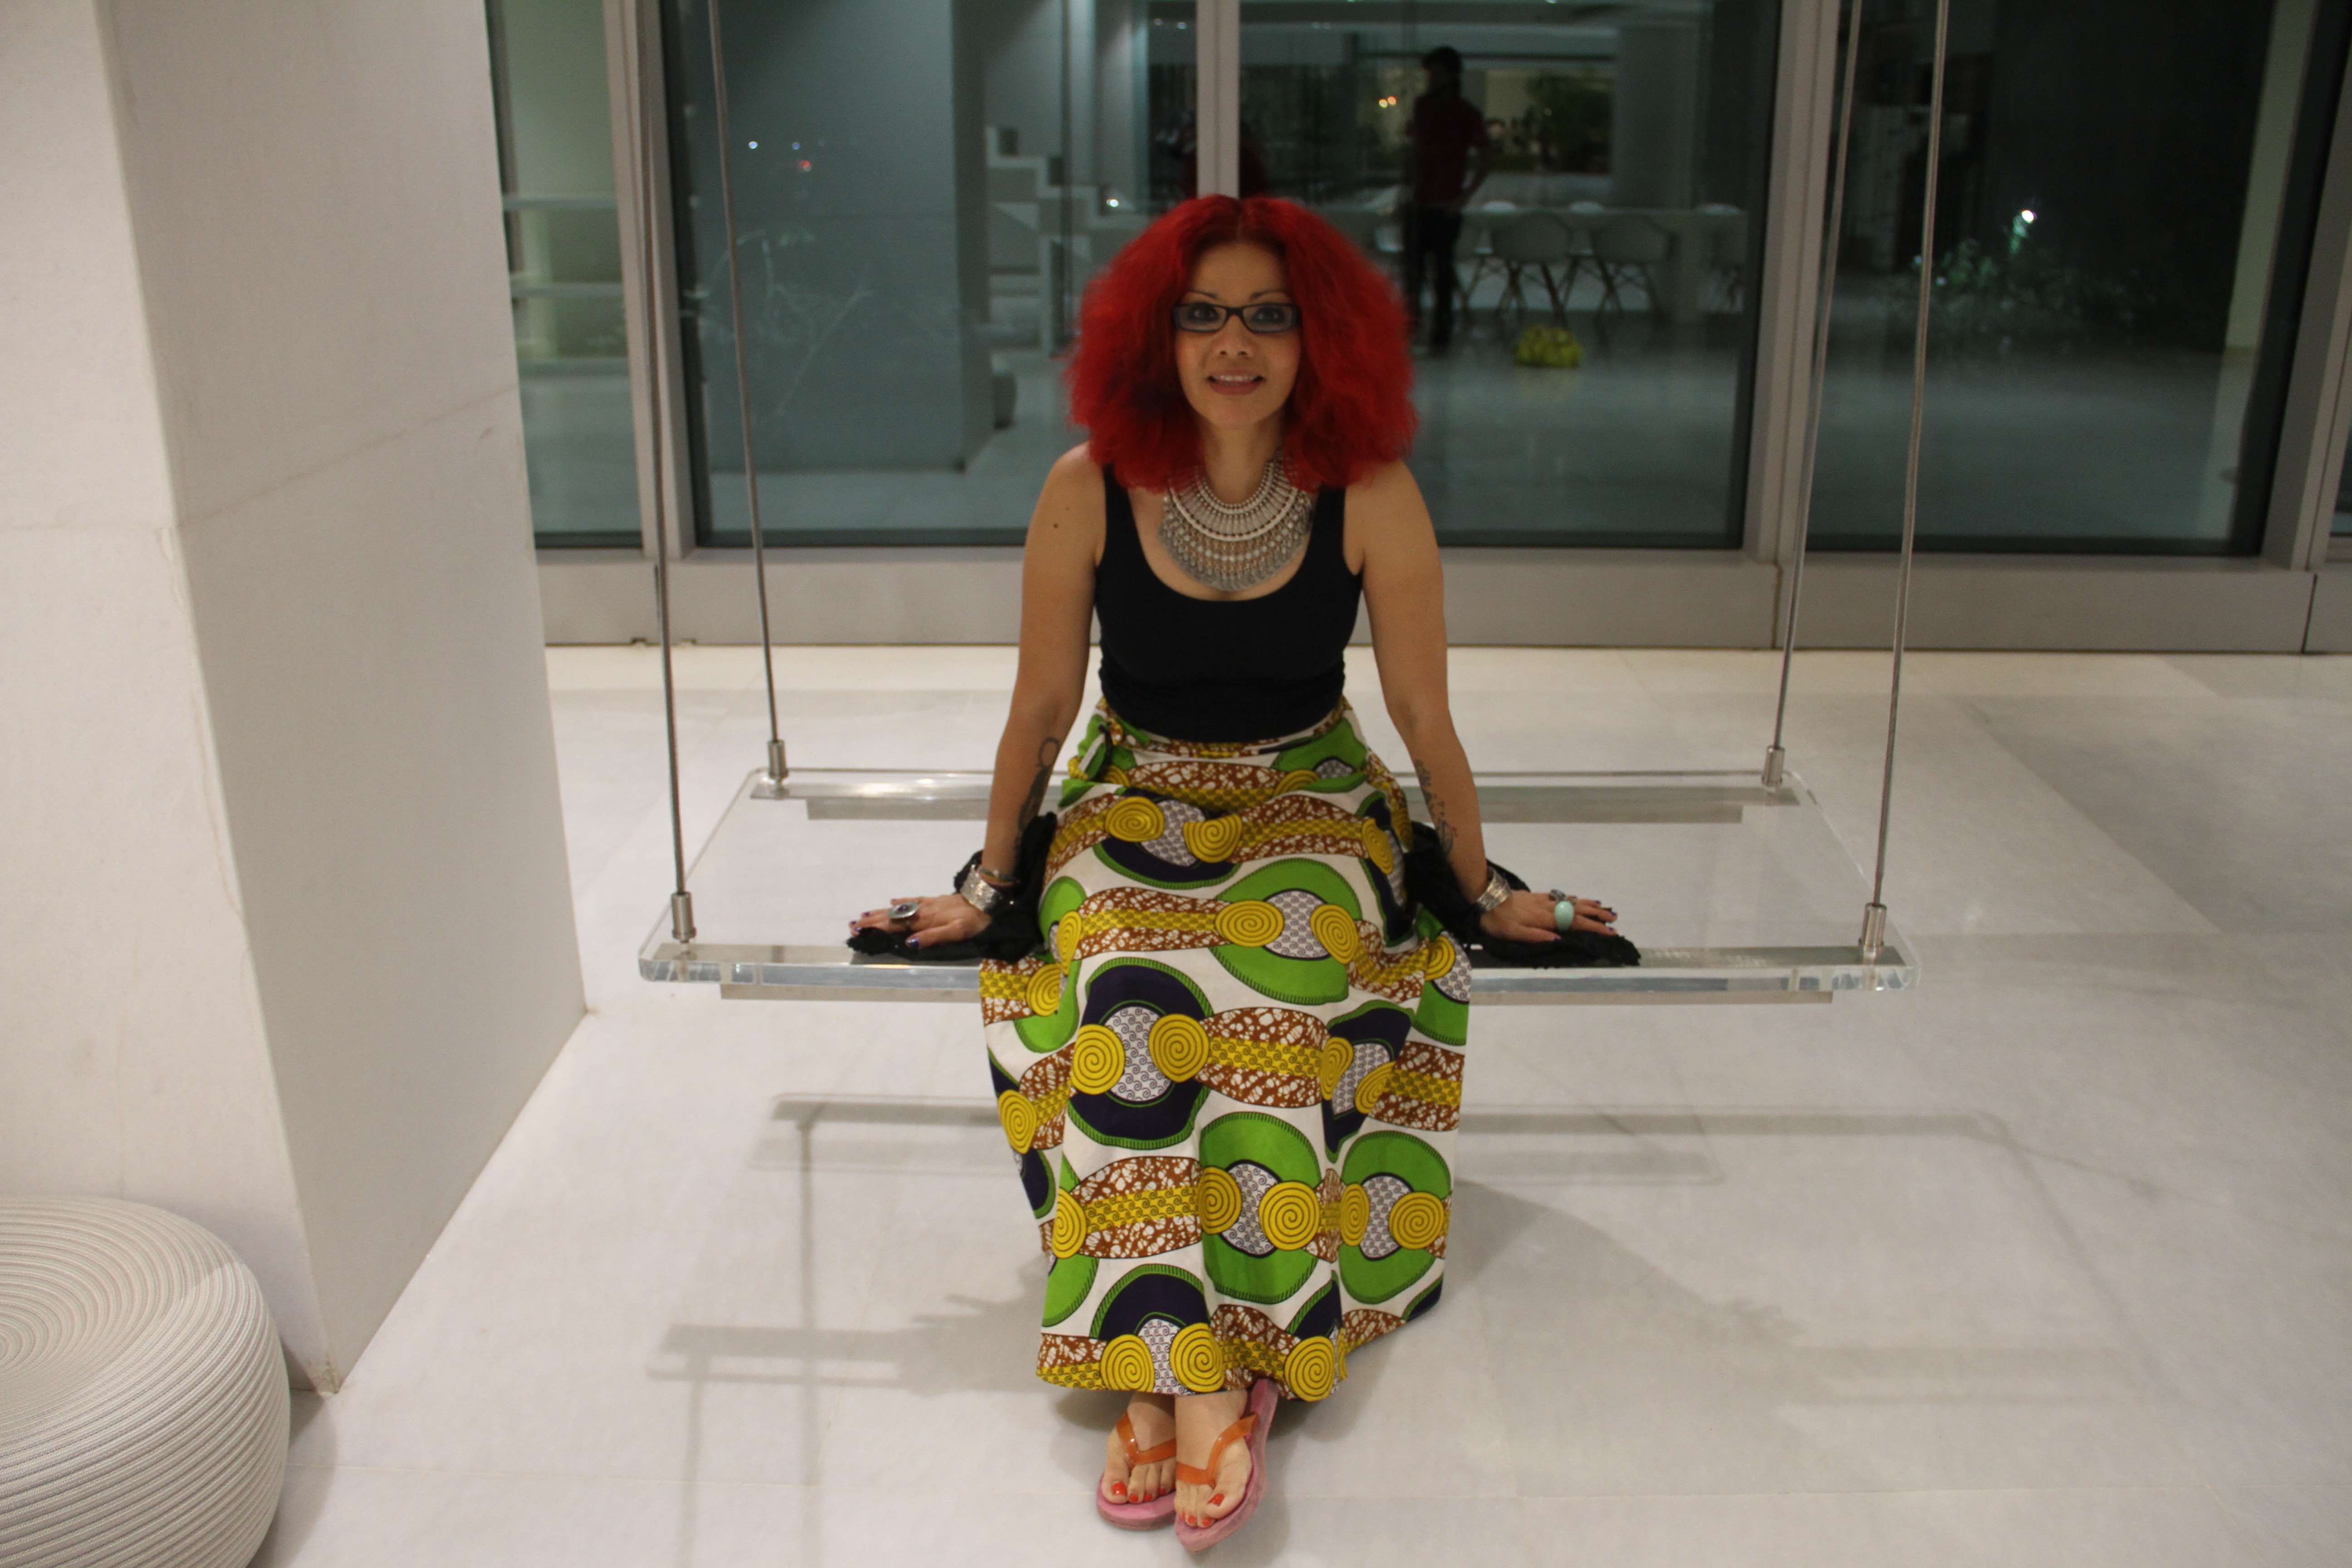 Mona Eltahawy. Credit: Godrej India Culture Lab